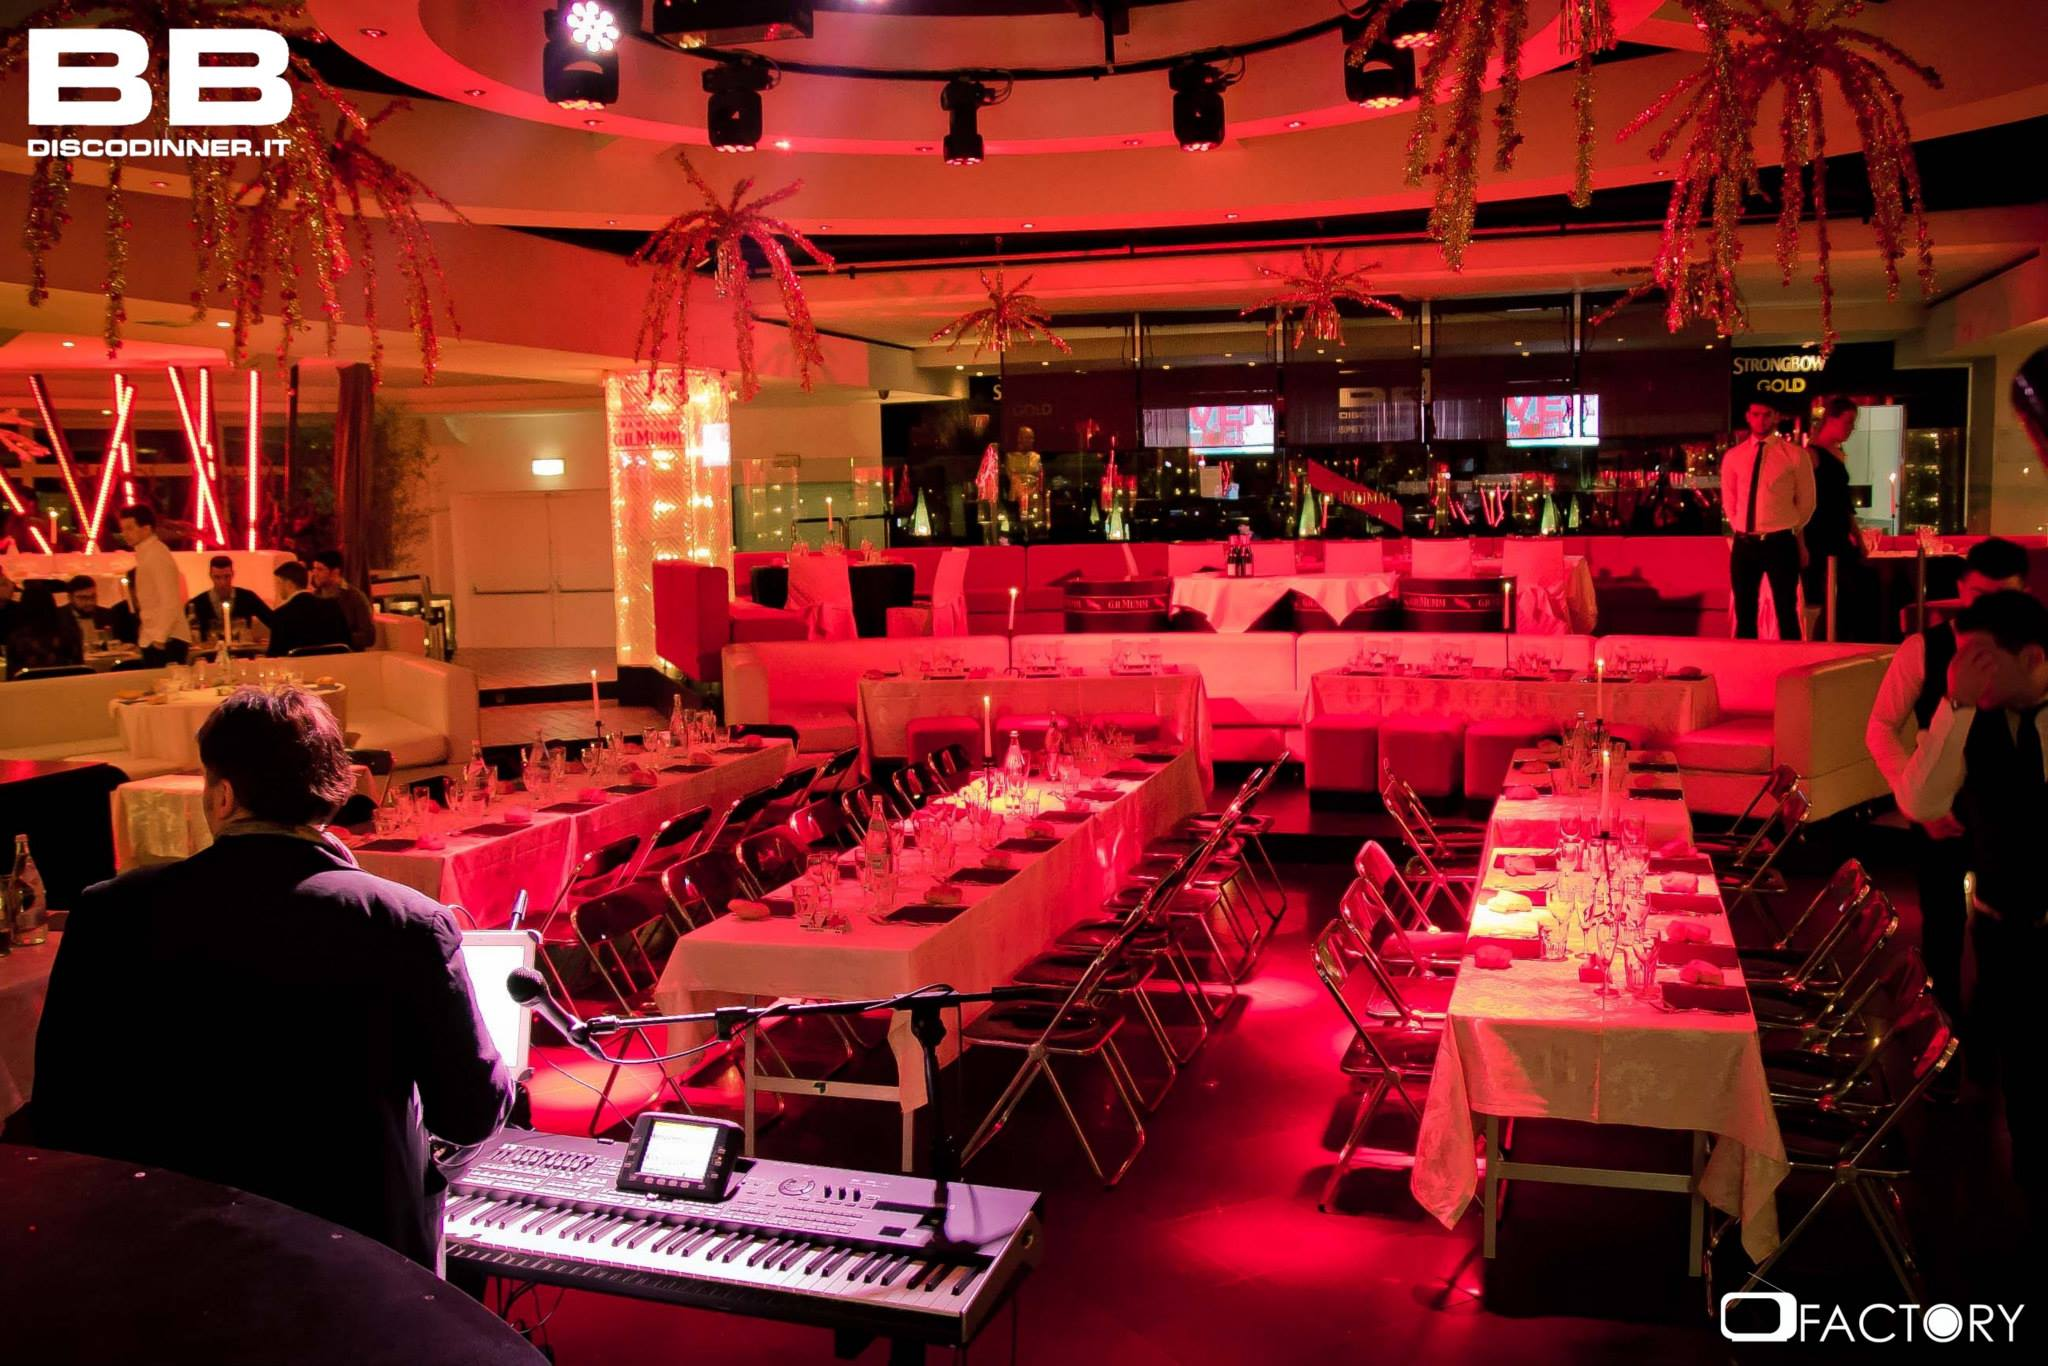 Discoteca BB, Halloween School Party